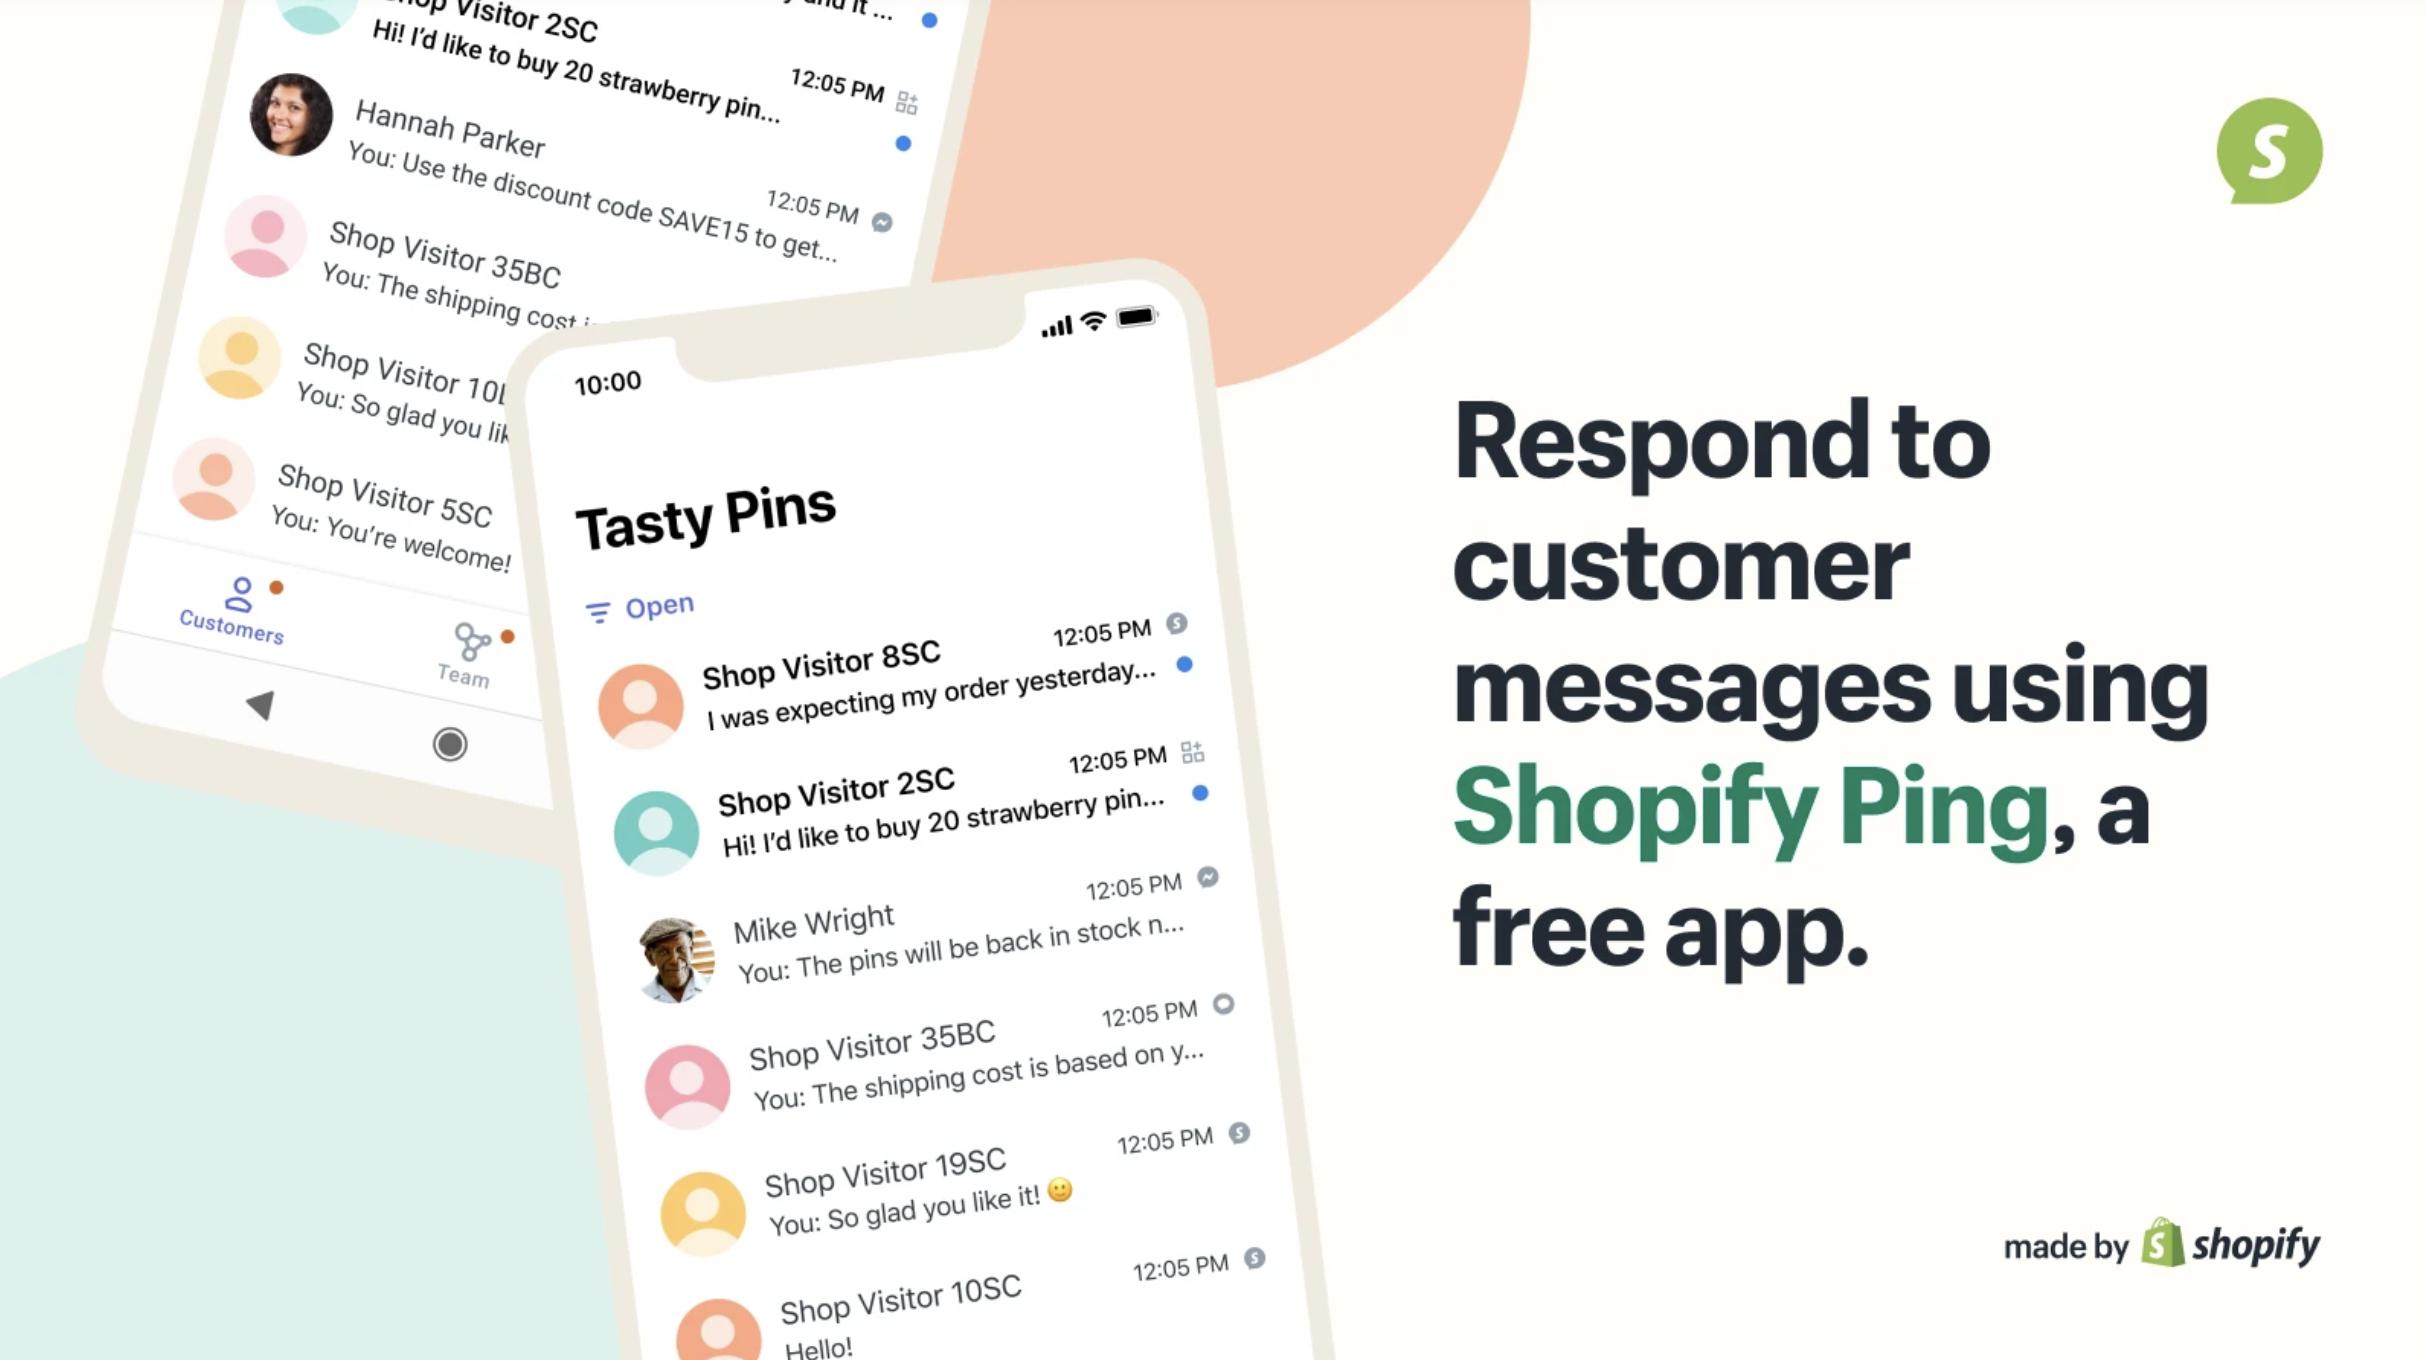 Shopify Ping